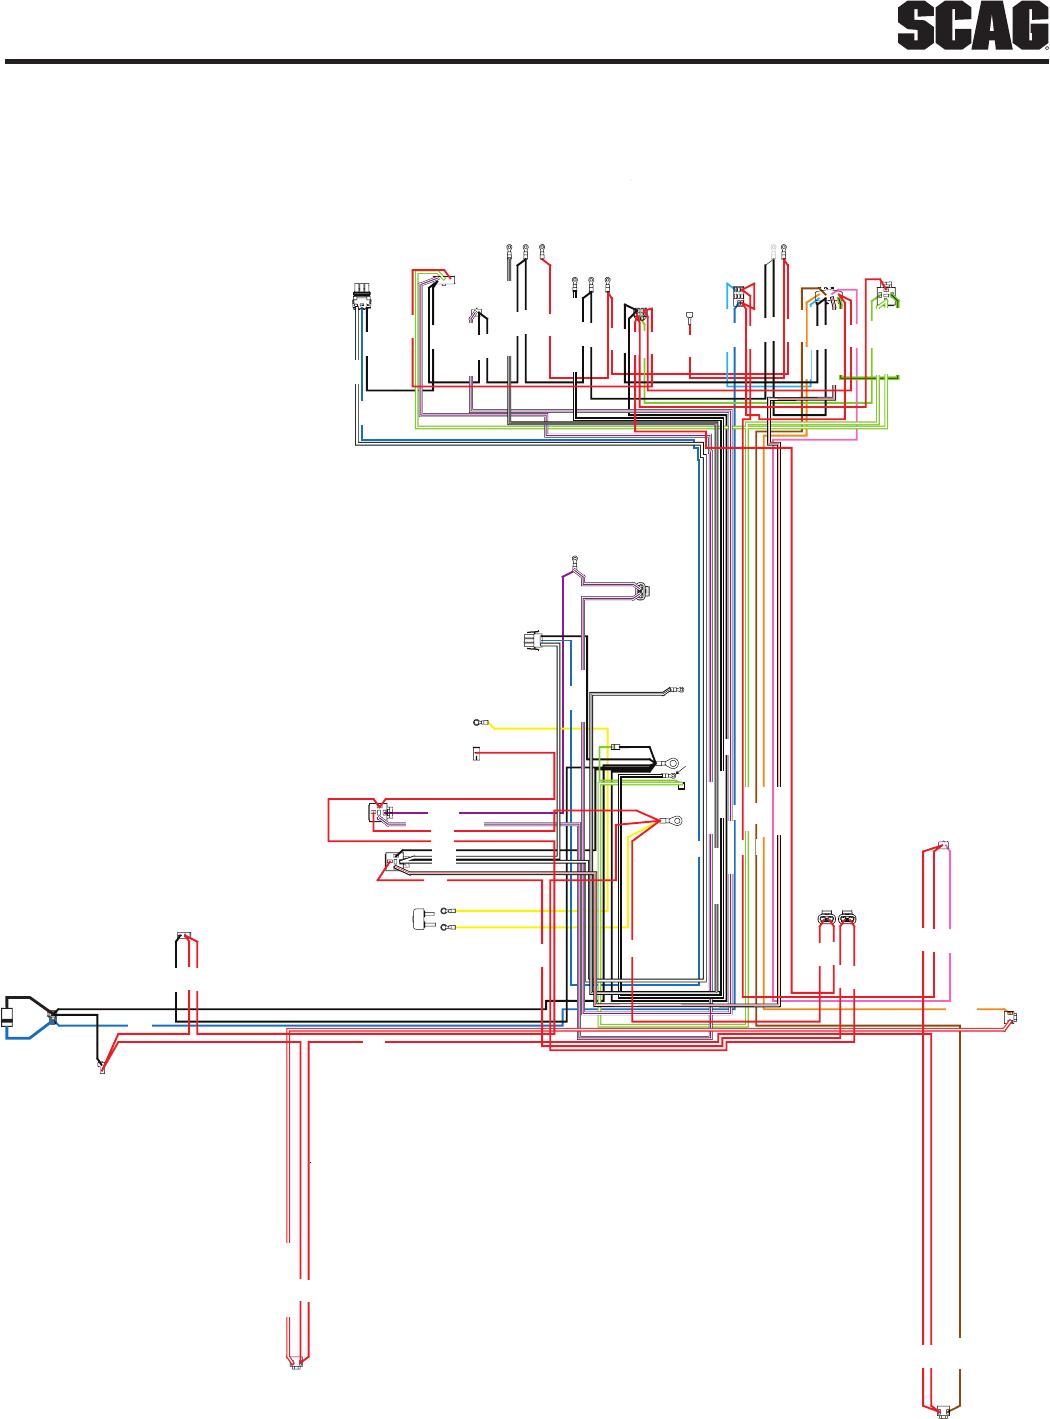 kawasaki scag turf tiger wiring diagram